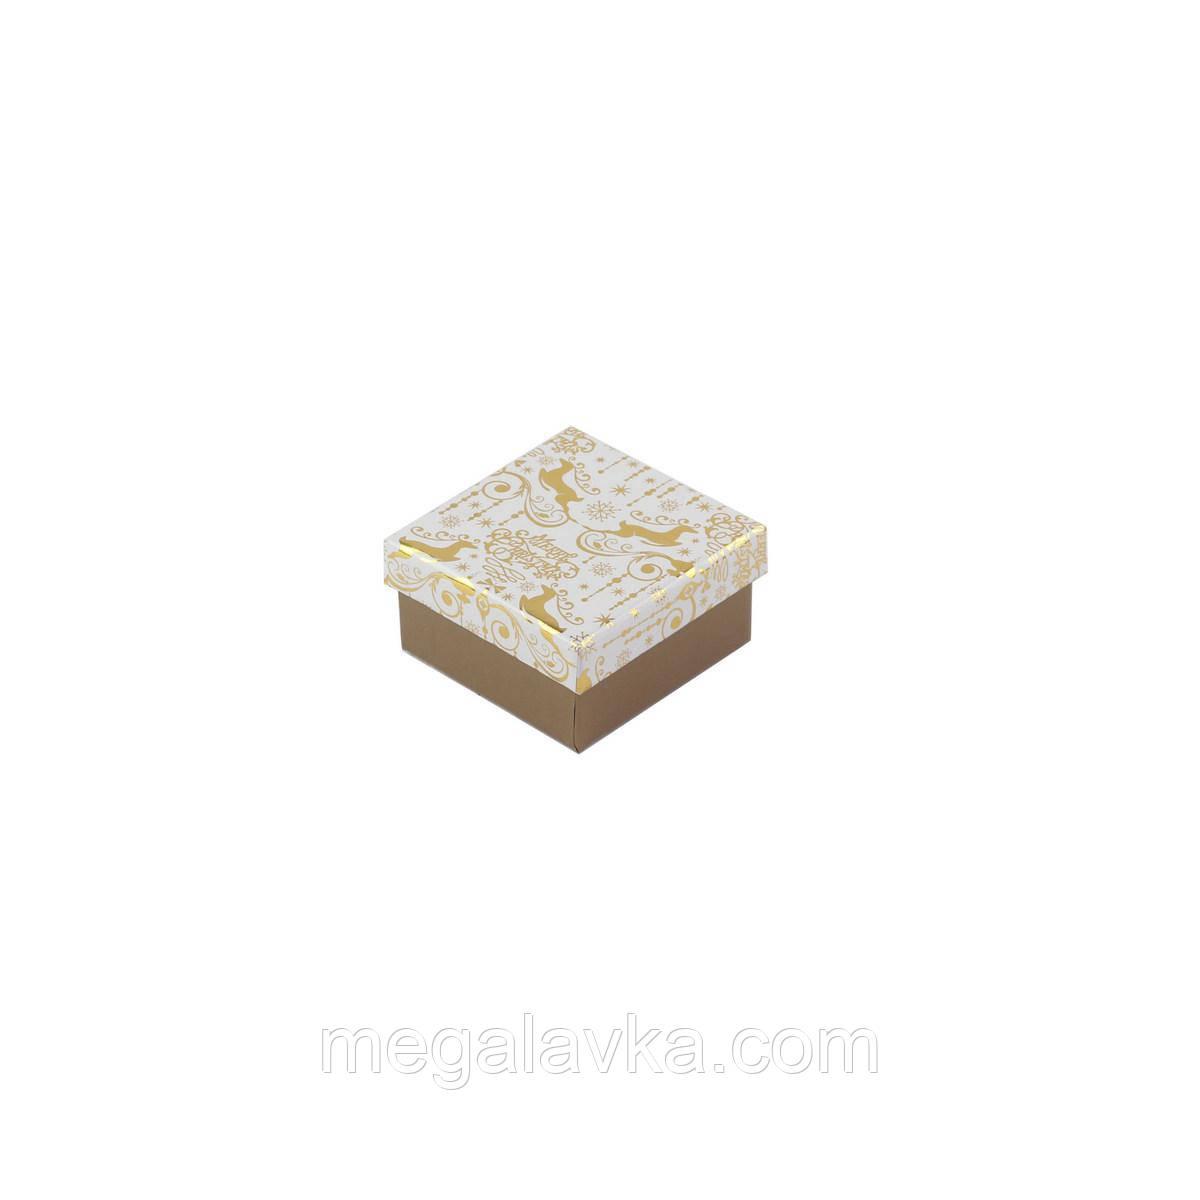 Коробка подарочная Gold 8 х 8 х 8 см